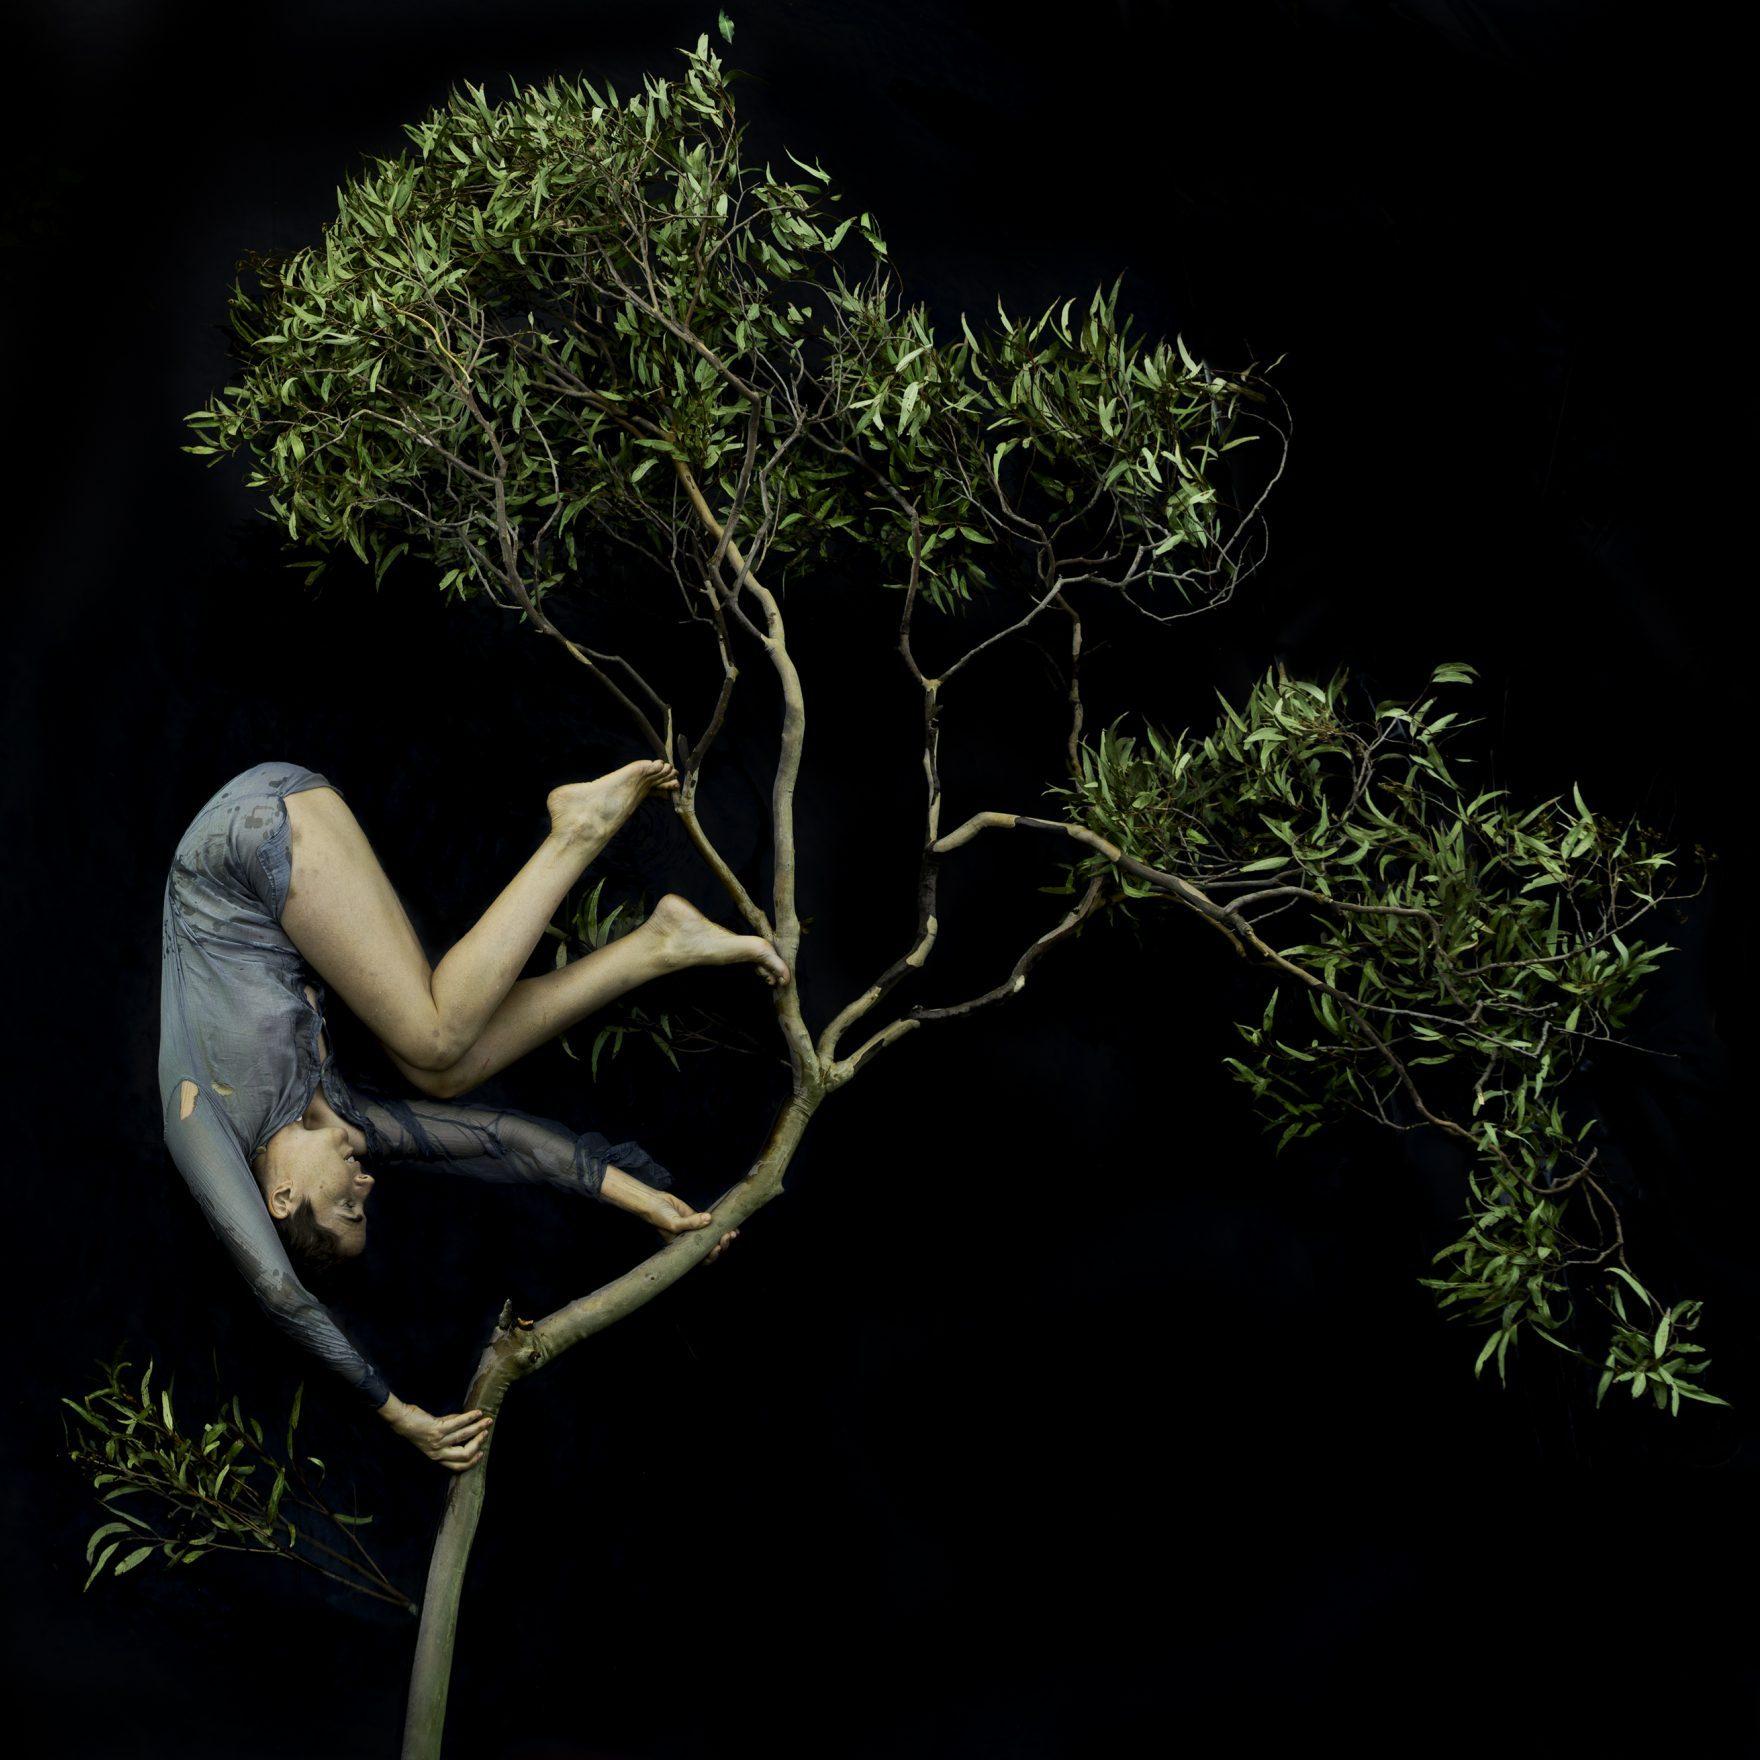 © Tamara Dean & Michael Reid SydneyBerlin_Tumbling through the treetops, 2020